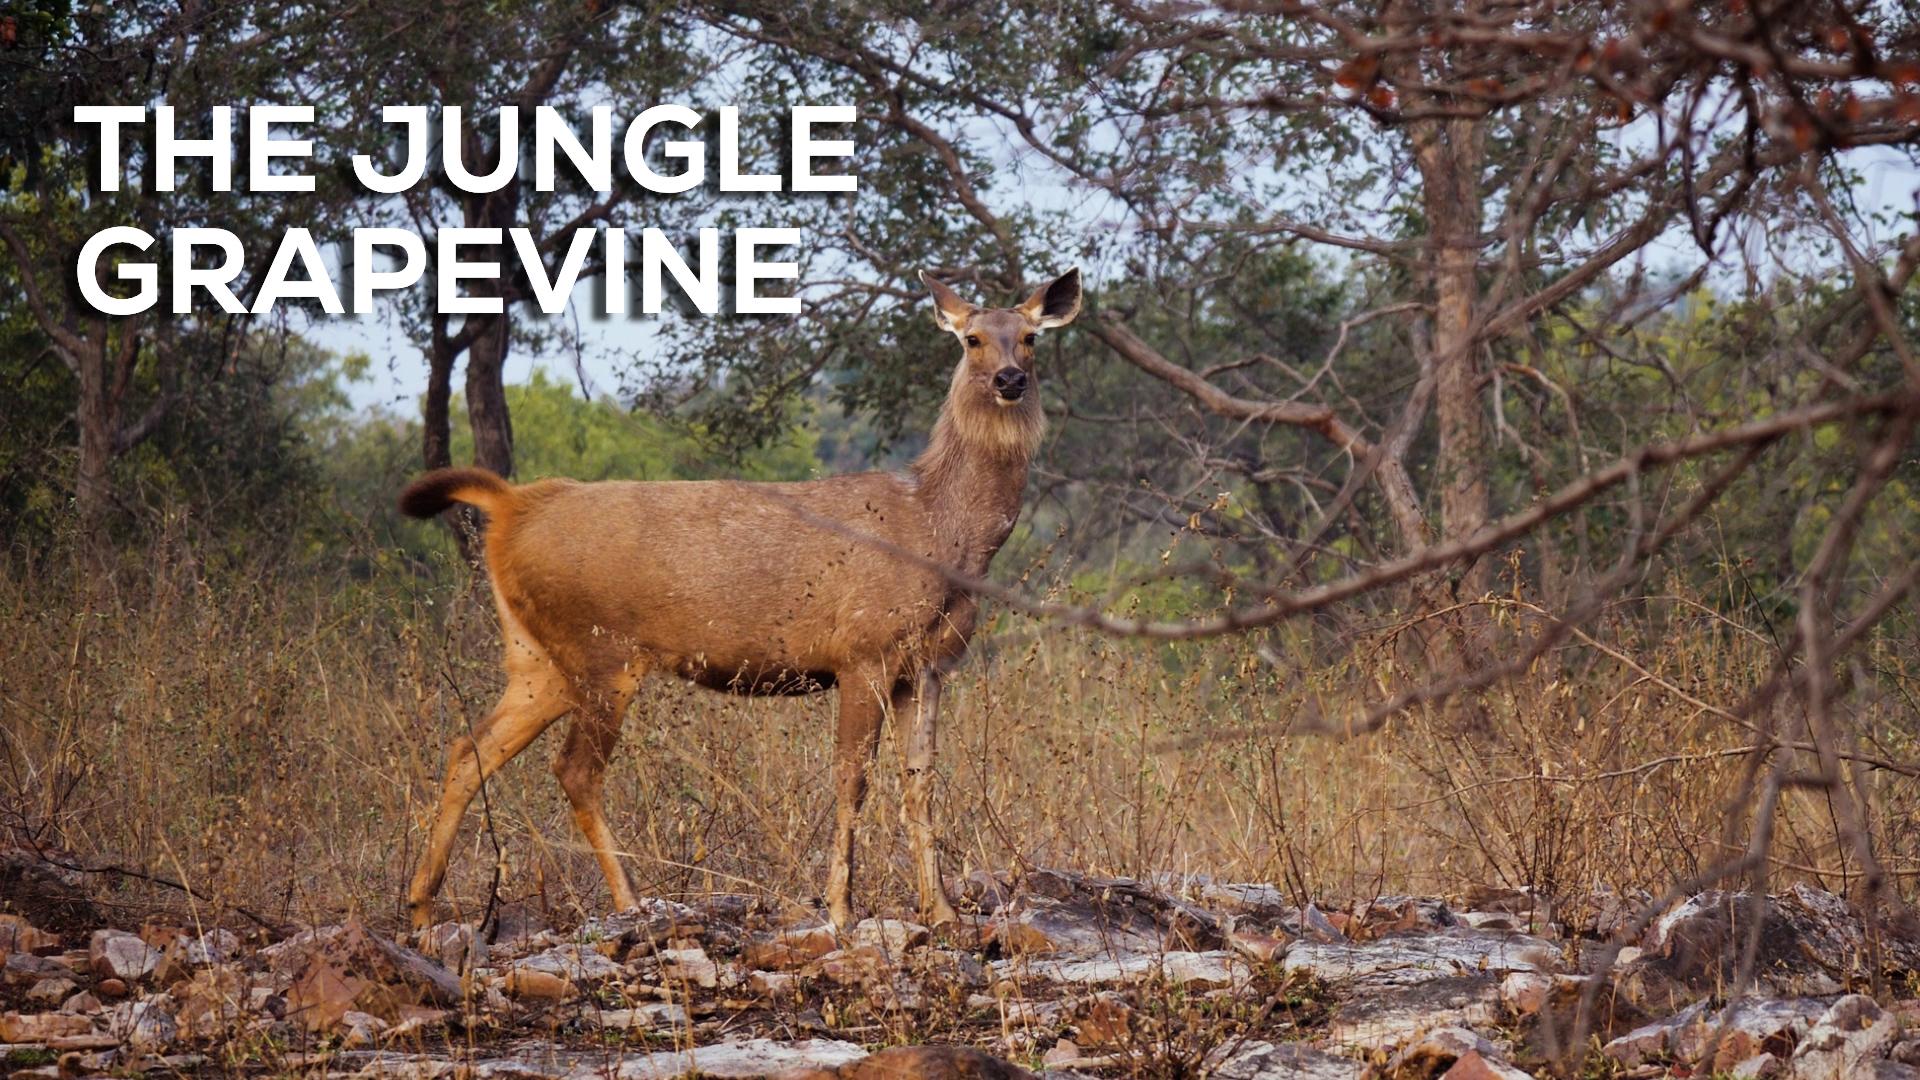 Red Alert: When a Leopard Hunts, the Jungle Grapevine Buzzes